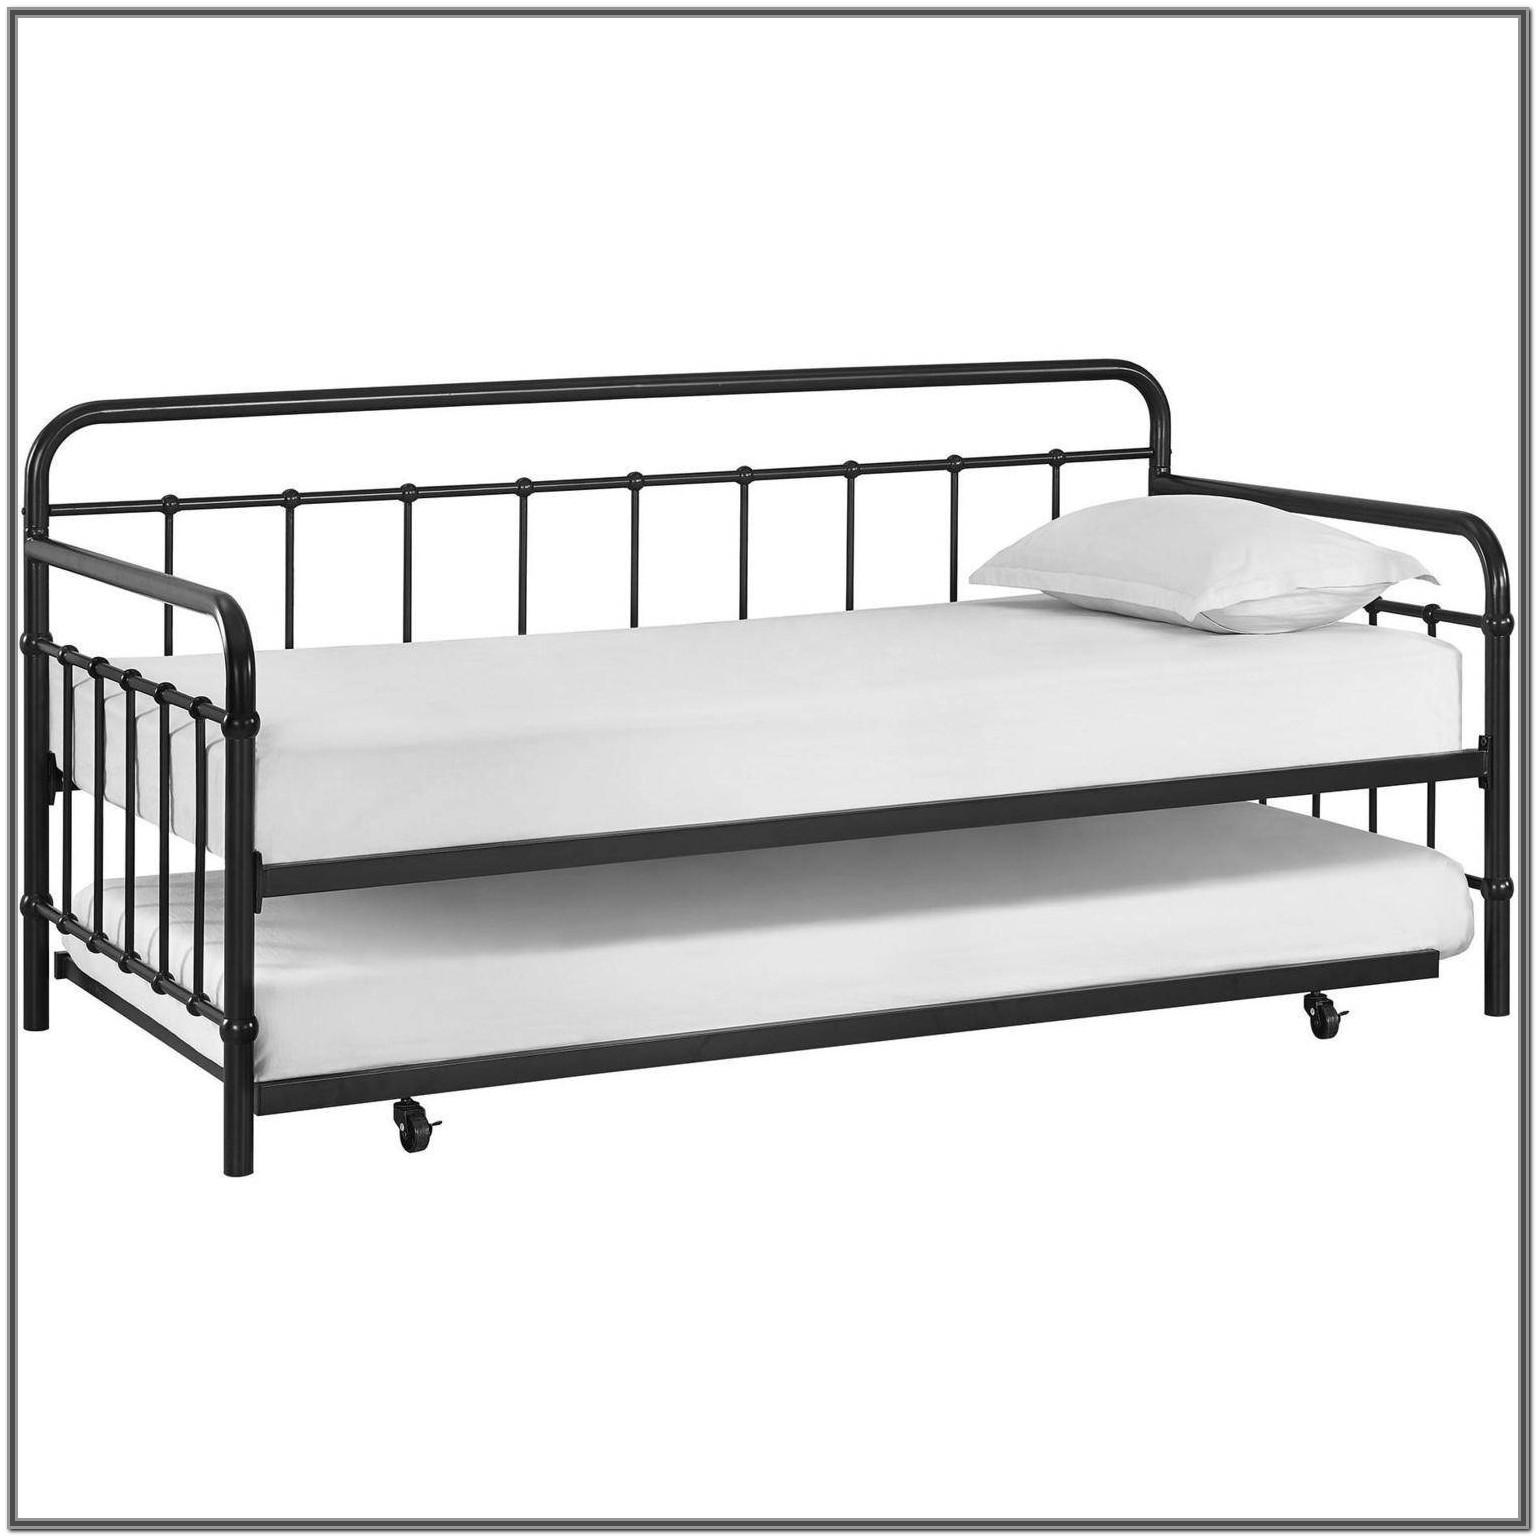 Full Size Pop Up Trundle Bed Frame